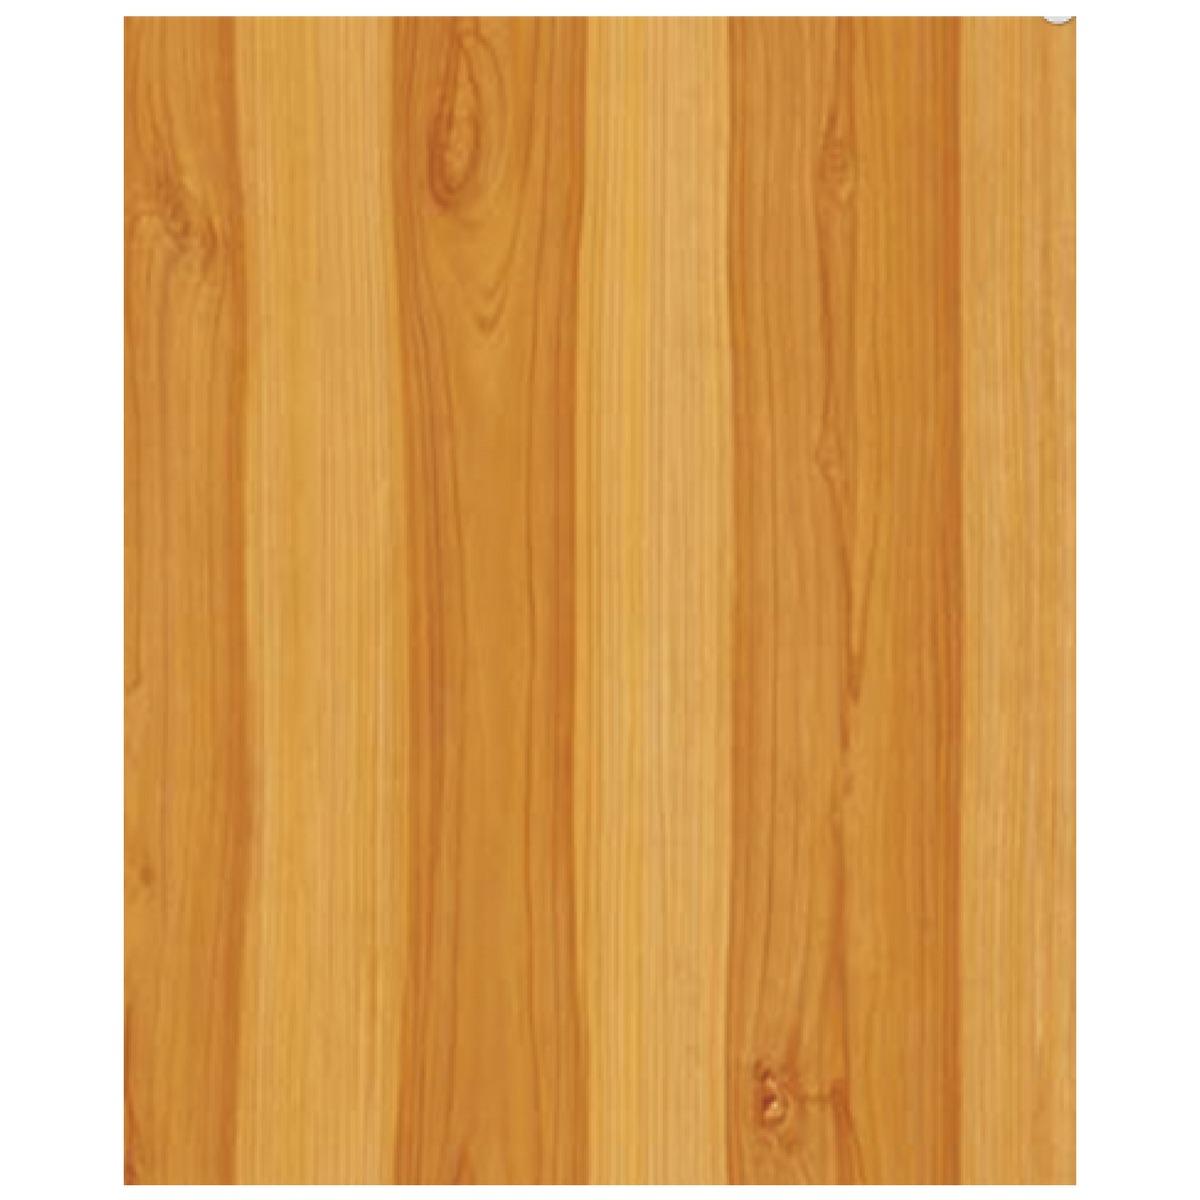 890bb8f19 papel adesivo contact madeira tipo pinus 45cm x 1 metro. Carregando zoom.